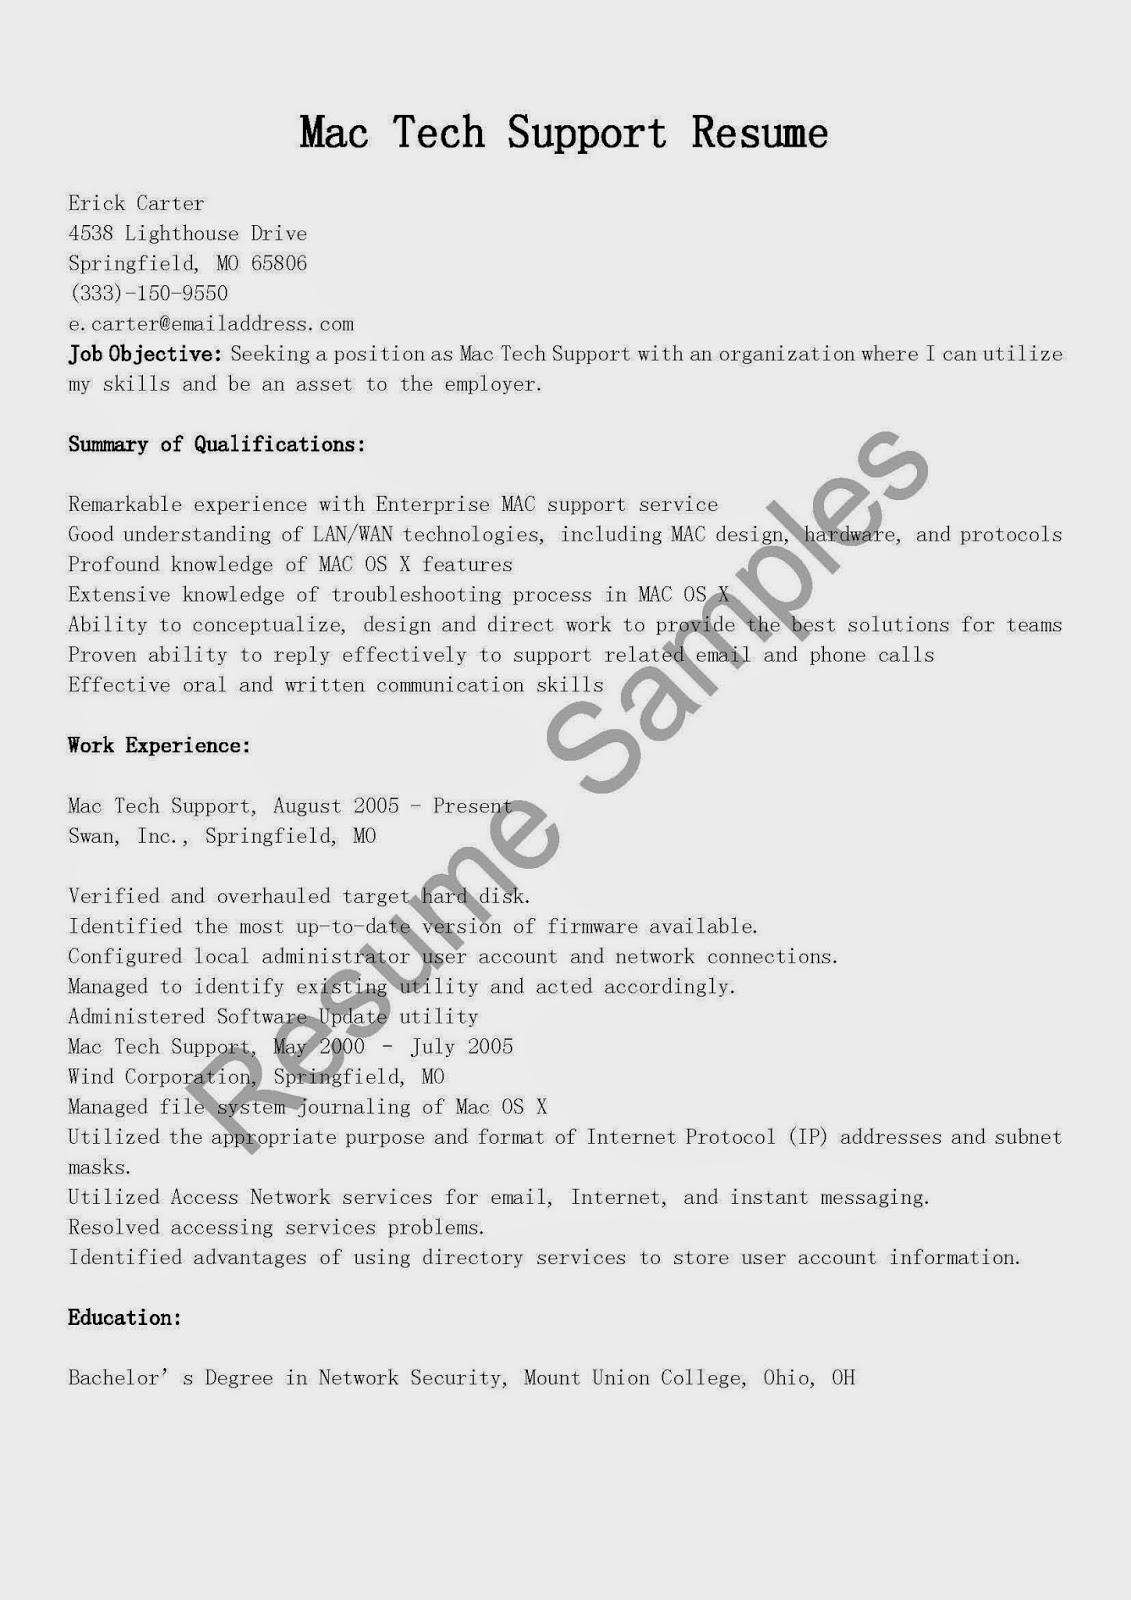 Resume Samples Mac Tech Support Resume Sample